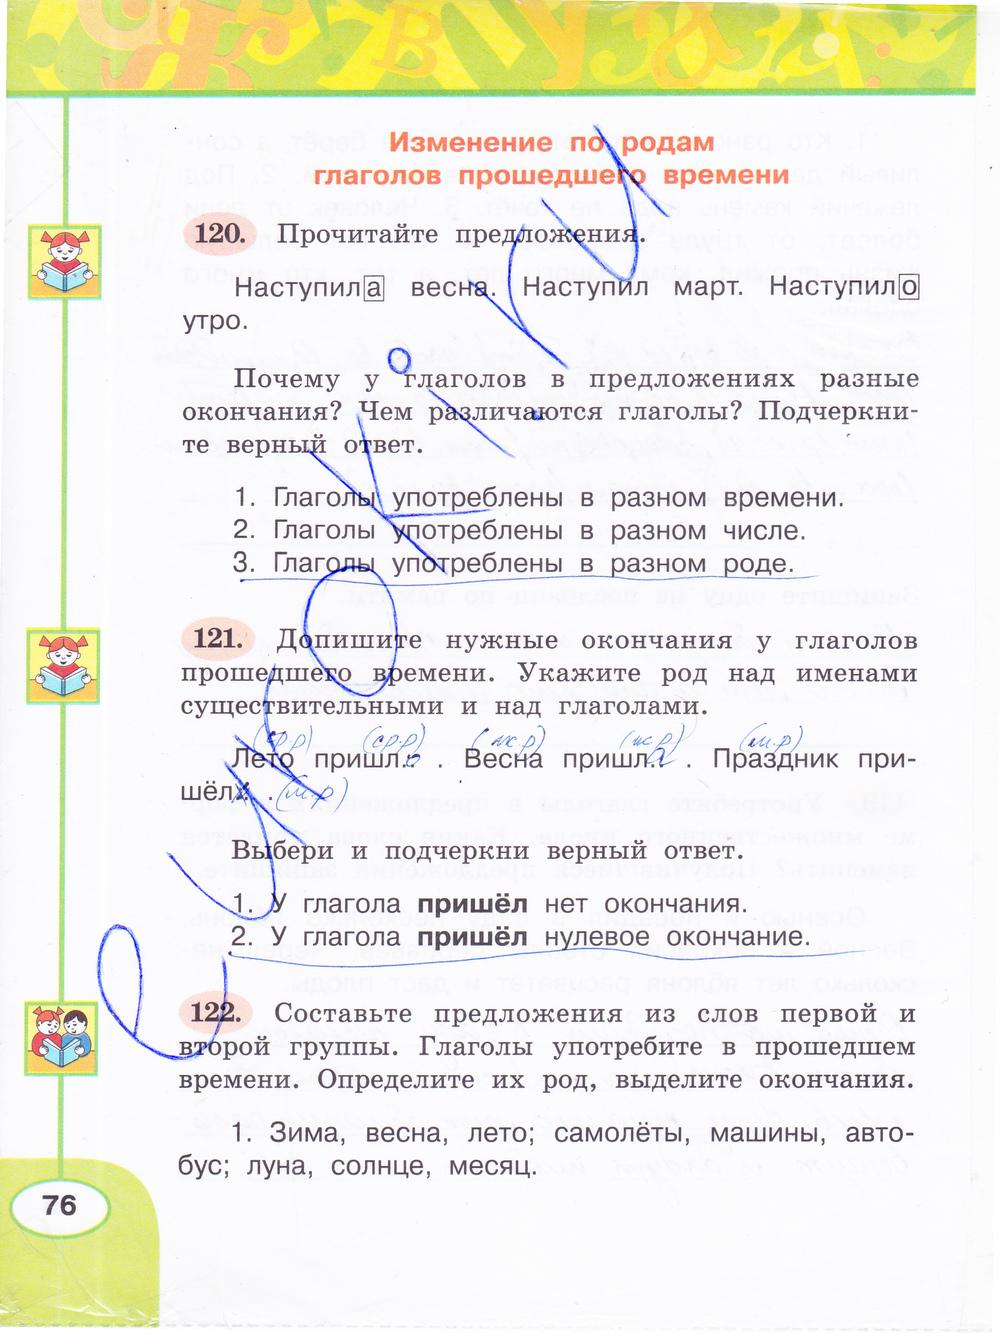 Гдз по русскому языку 3 климанова 1 часть рабочая тетрадь